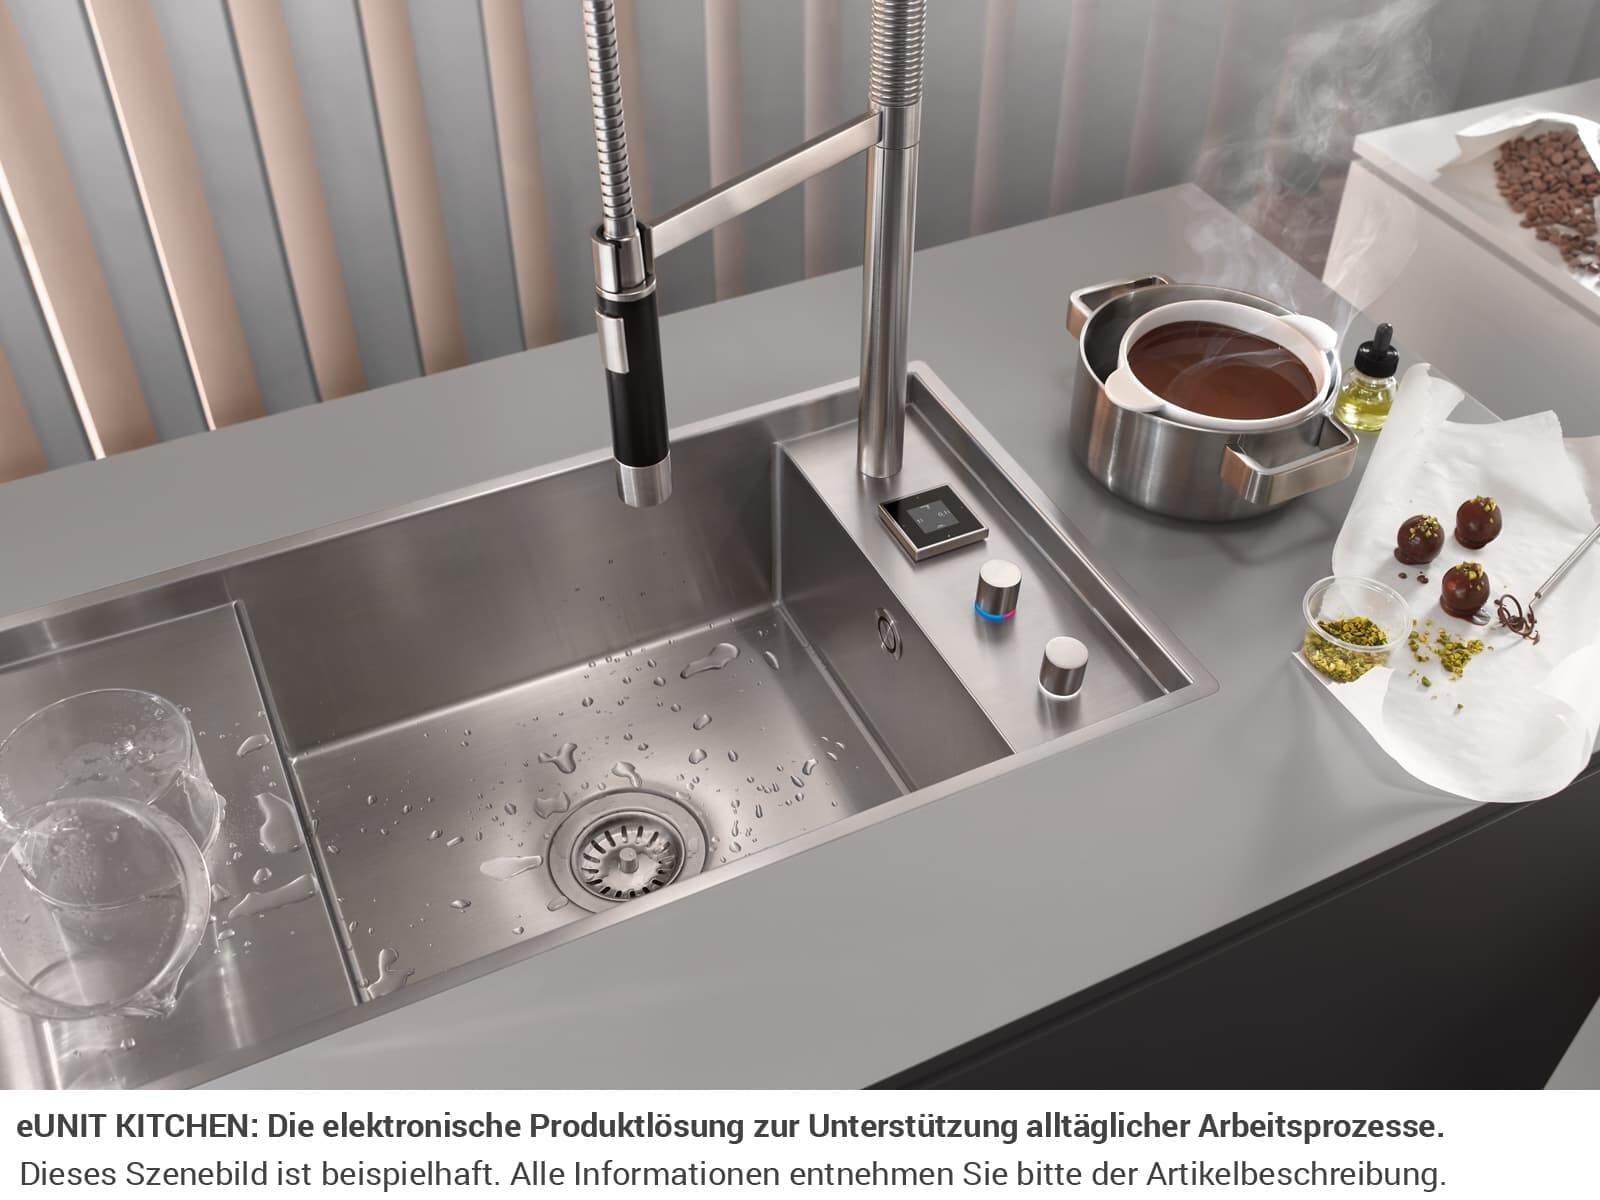 Dornbracht Tara Ultra Profi eUnit Kitchen Platin Matt 41 270 875-06 Hochdruckarmatur